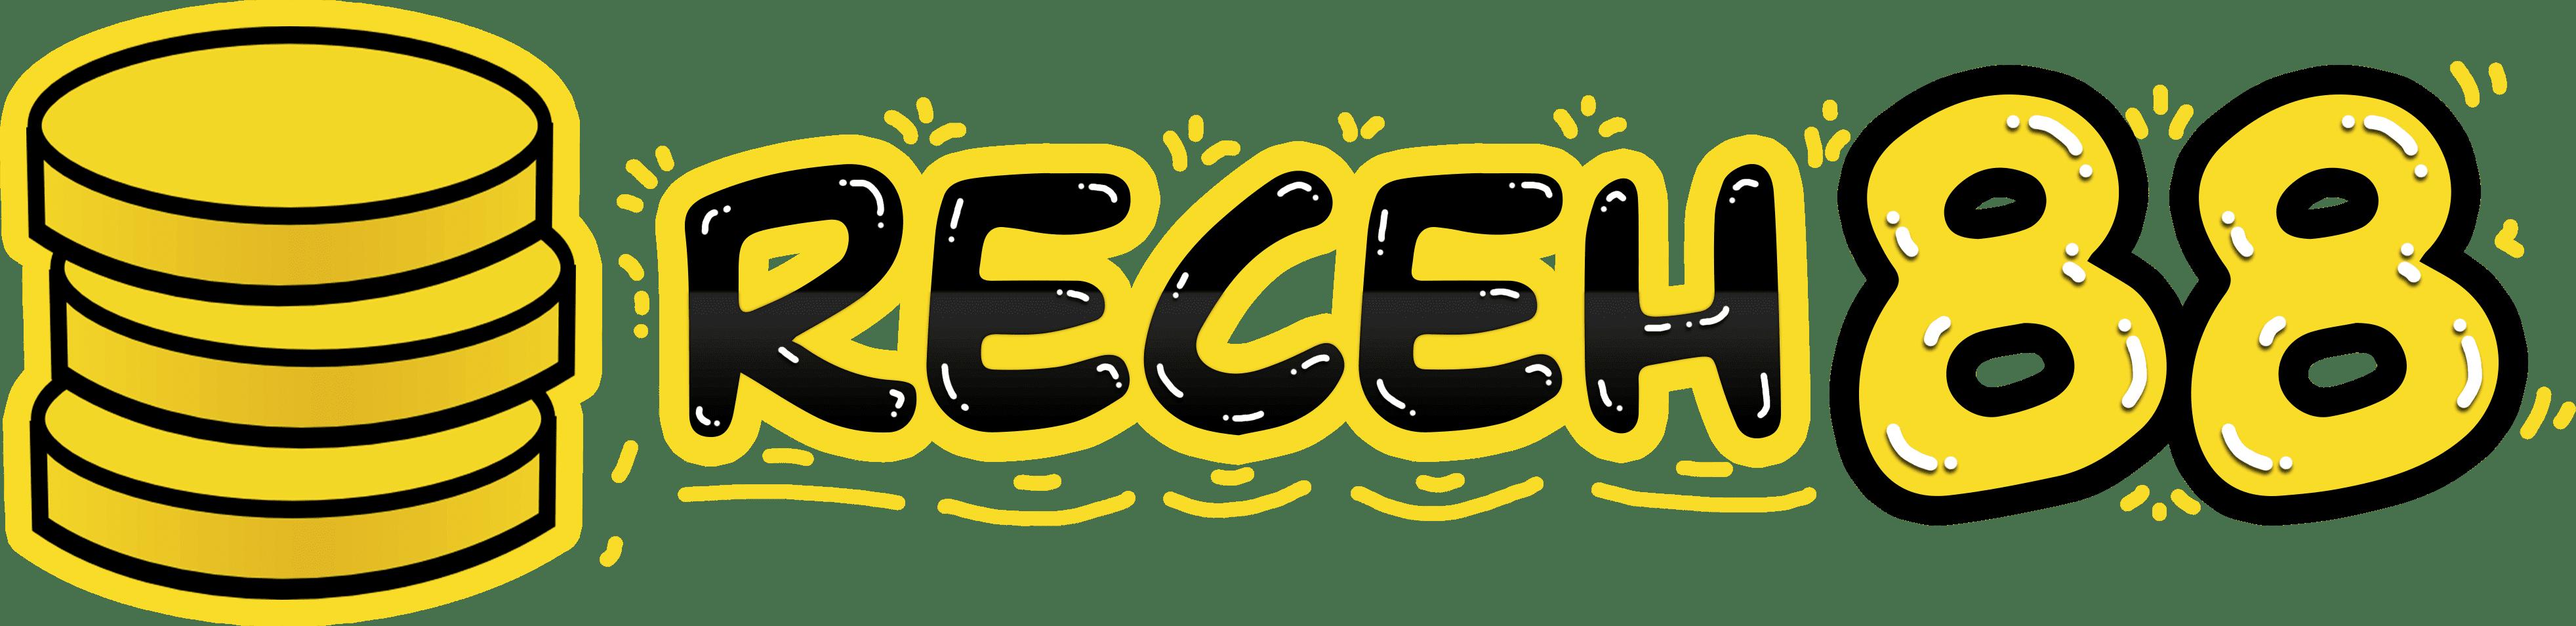 receh88